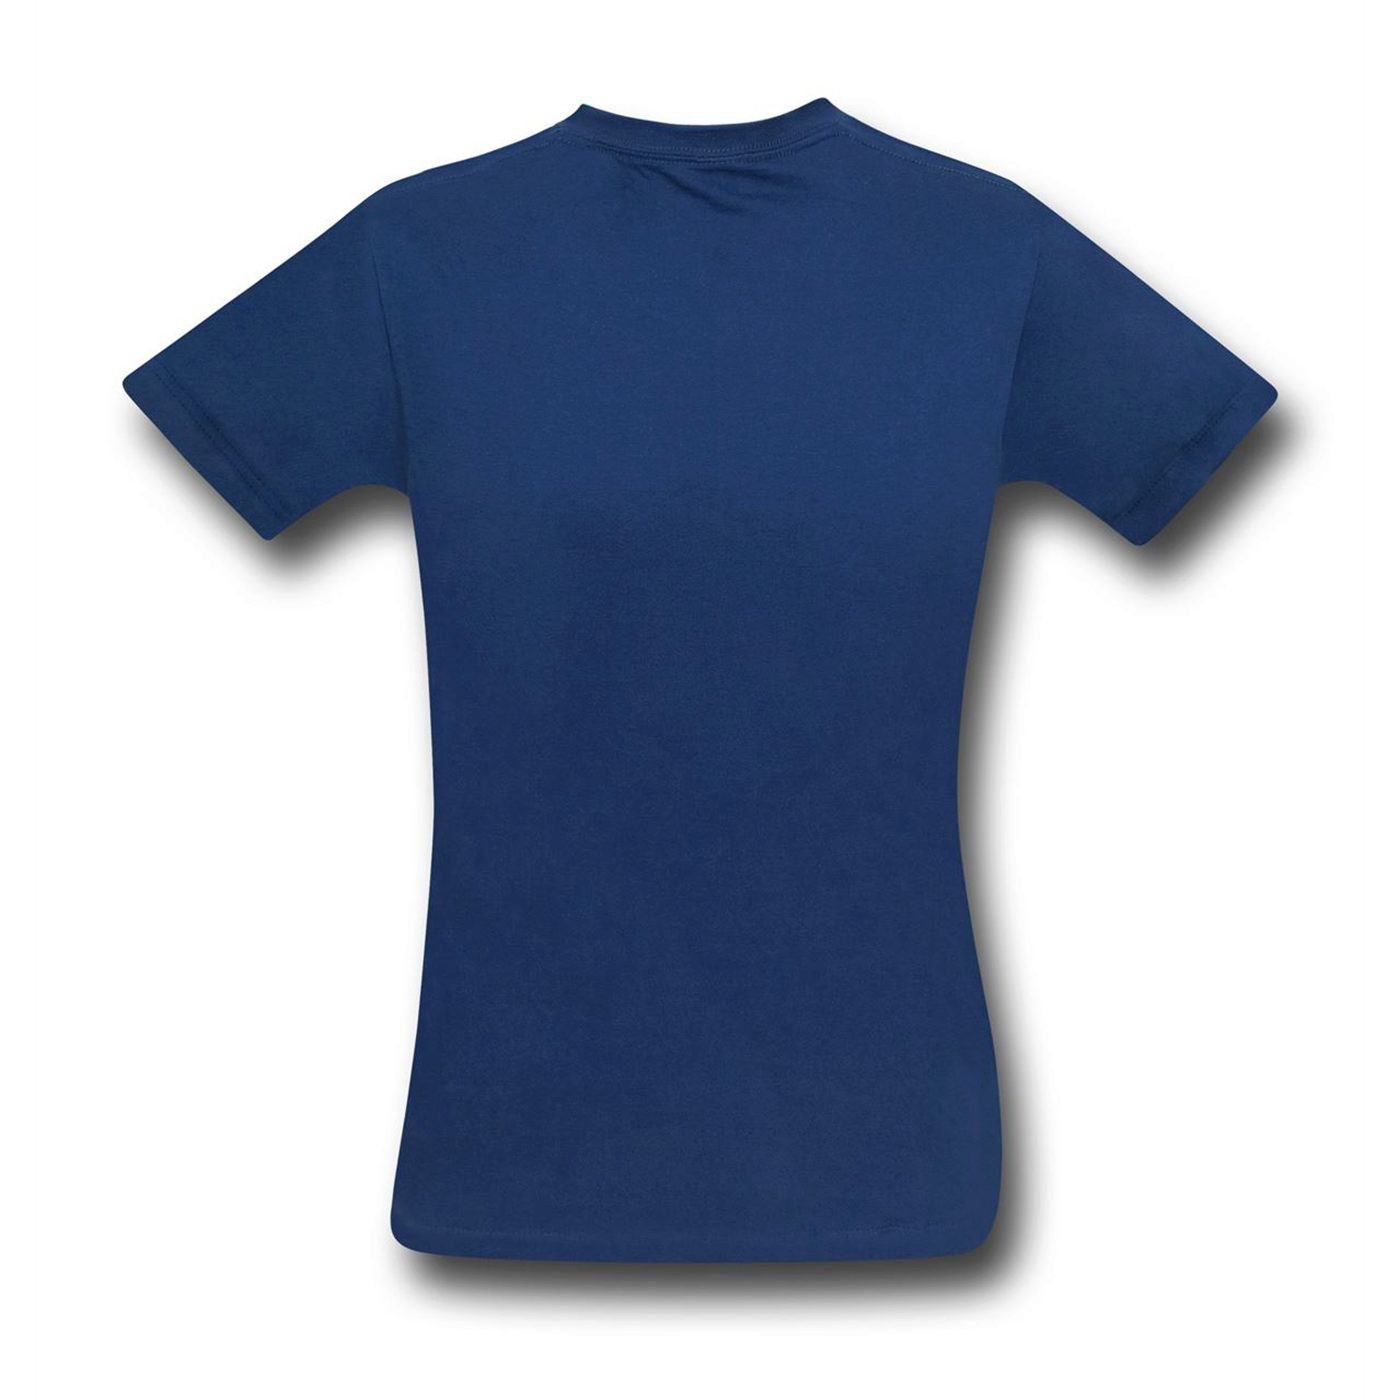 Captain America Civil War Costume T-Shirt